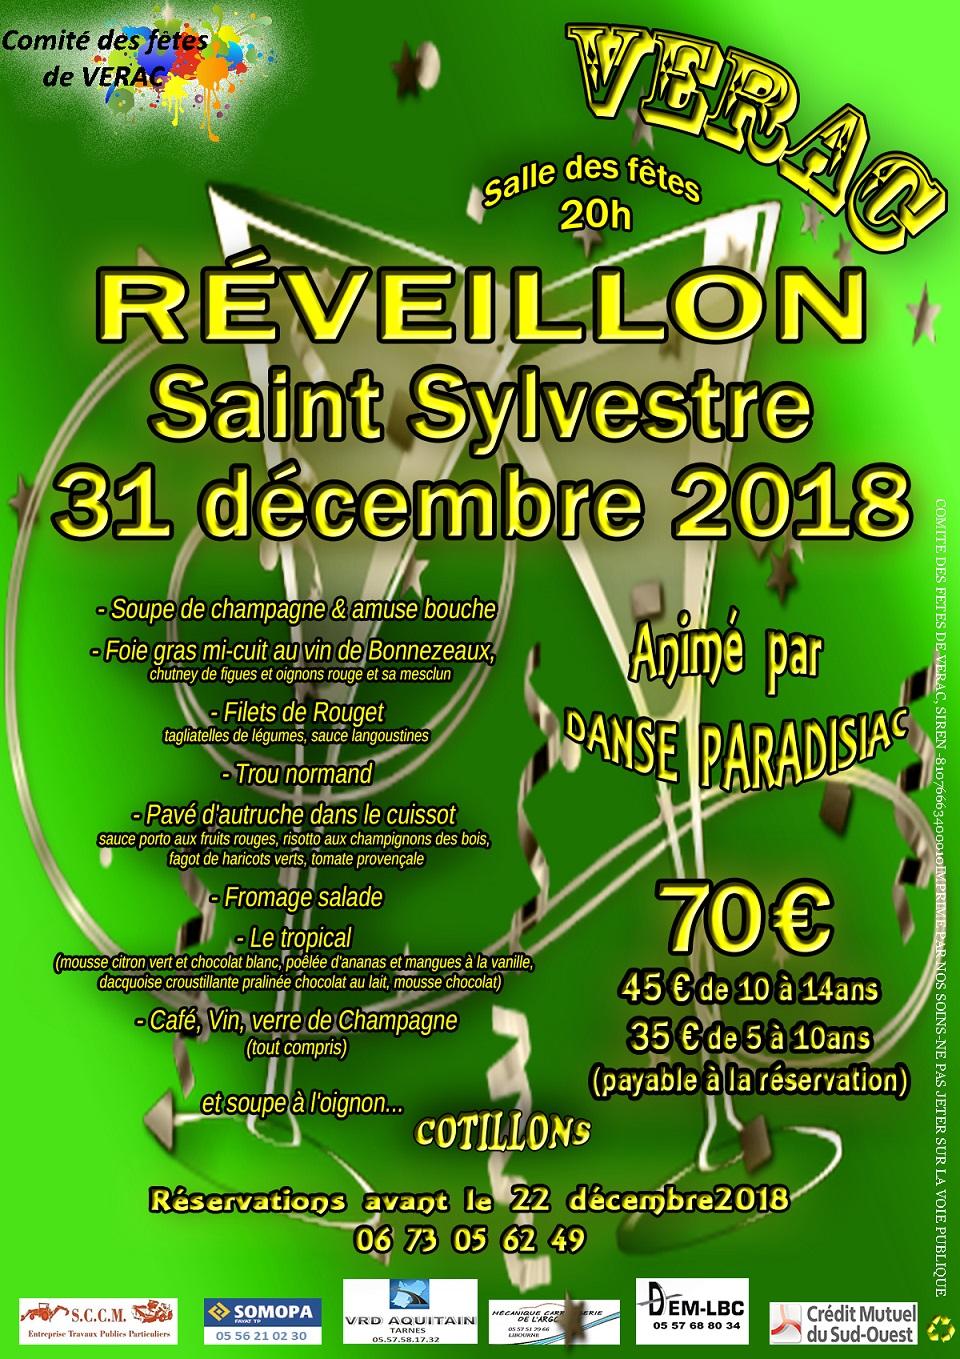 760e57ae97b Agenda culturel à St Denis De Pile (33910) - Spectable